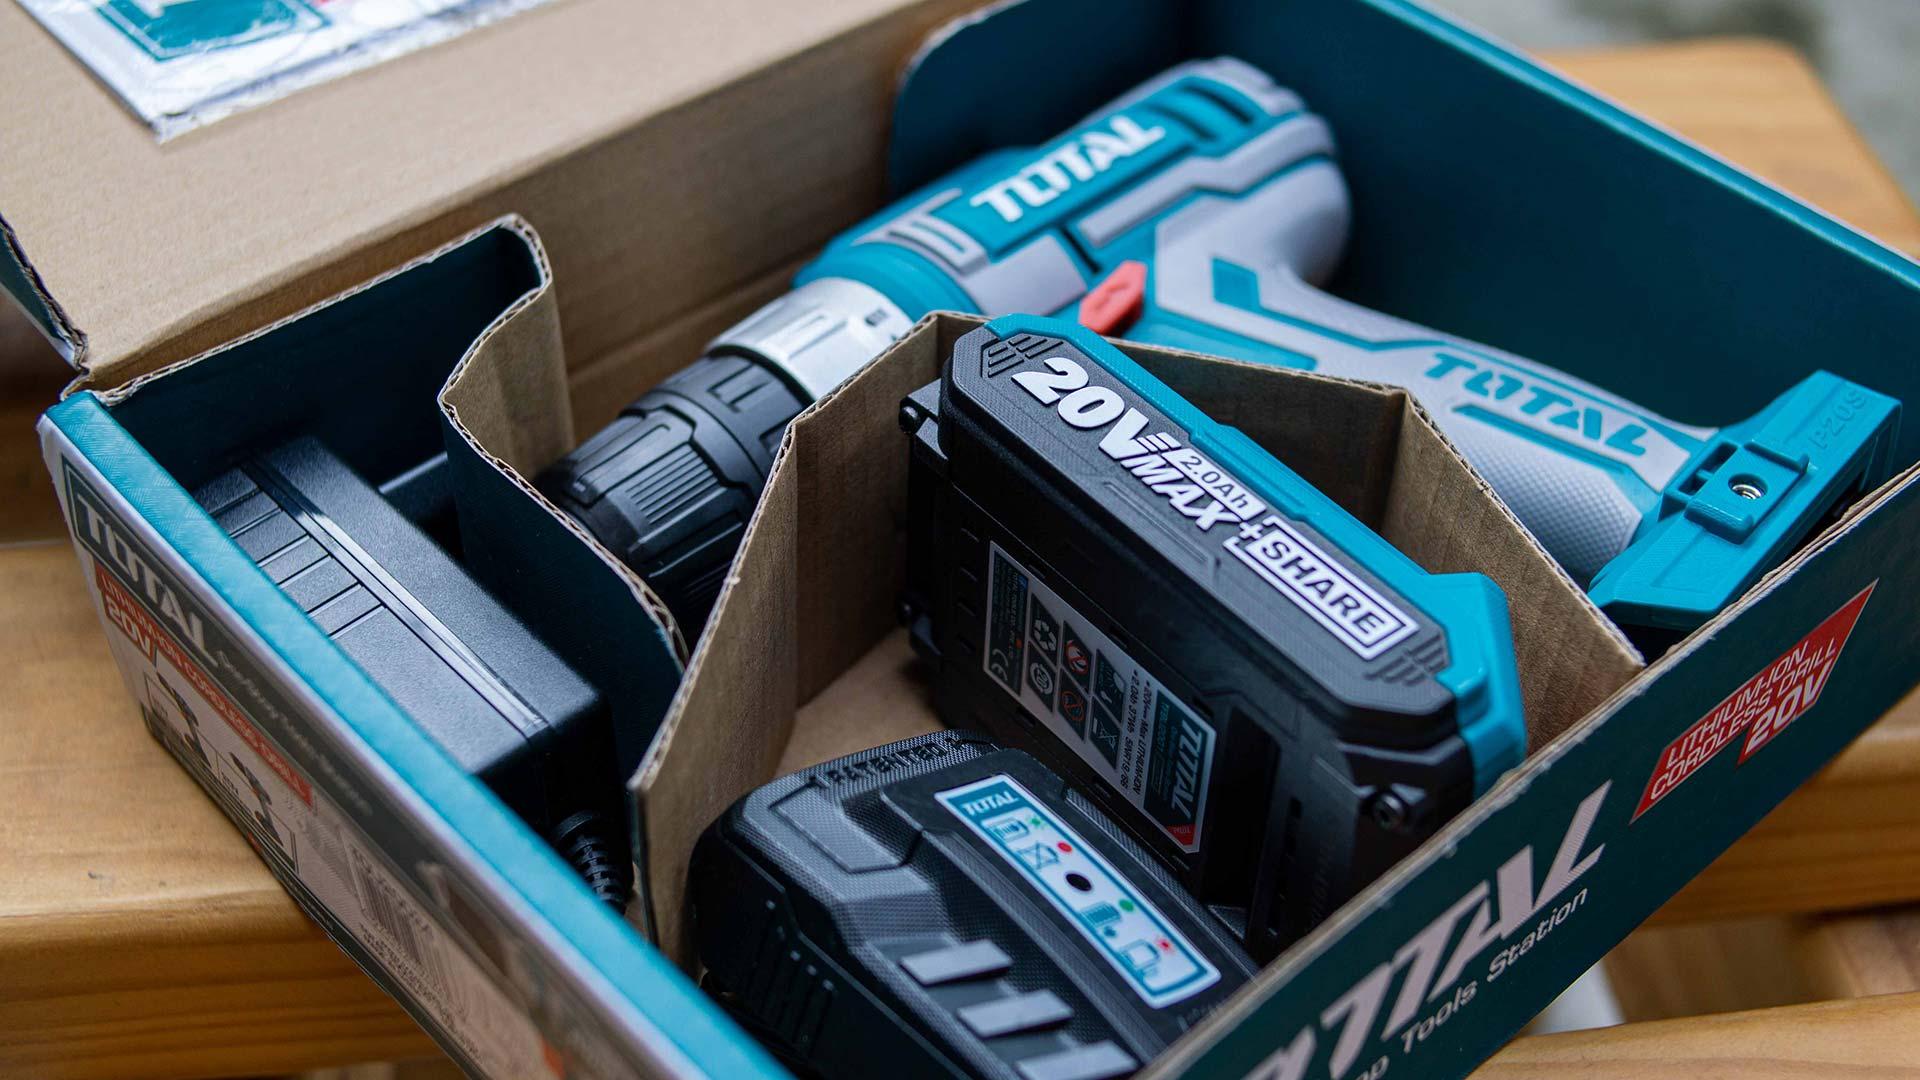 TDLI20024 photo shoot